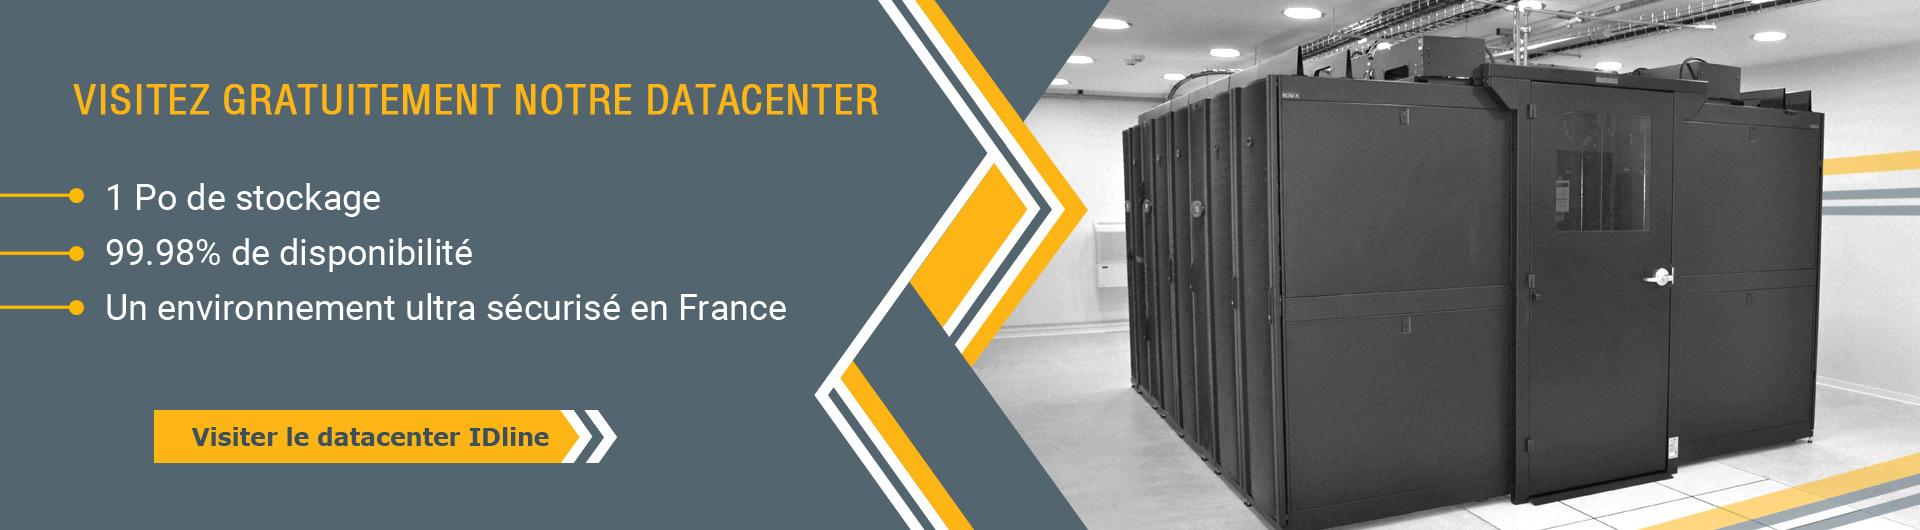 Datacenter IDline